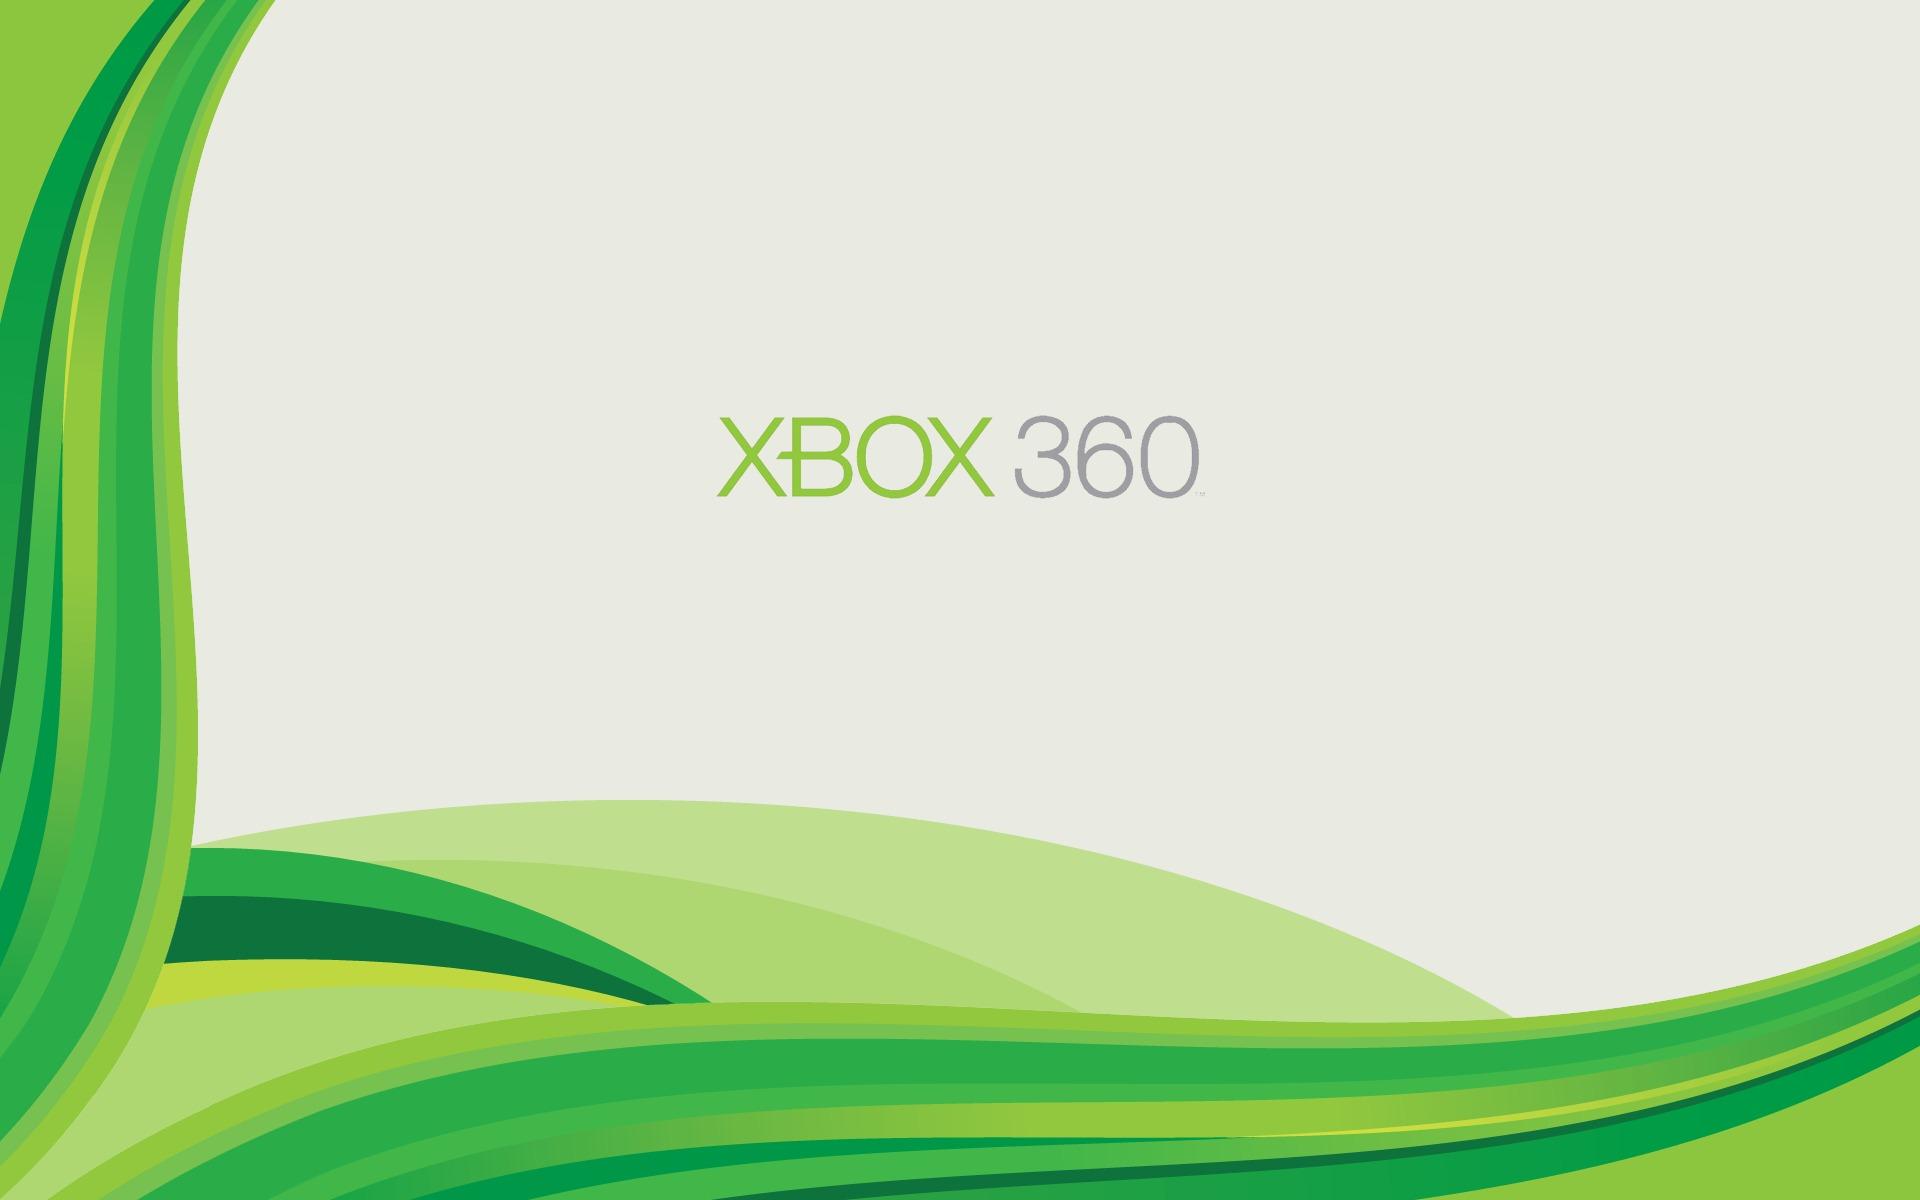 xbox 360 logo 1920x1200